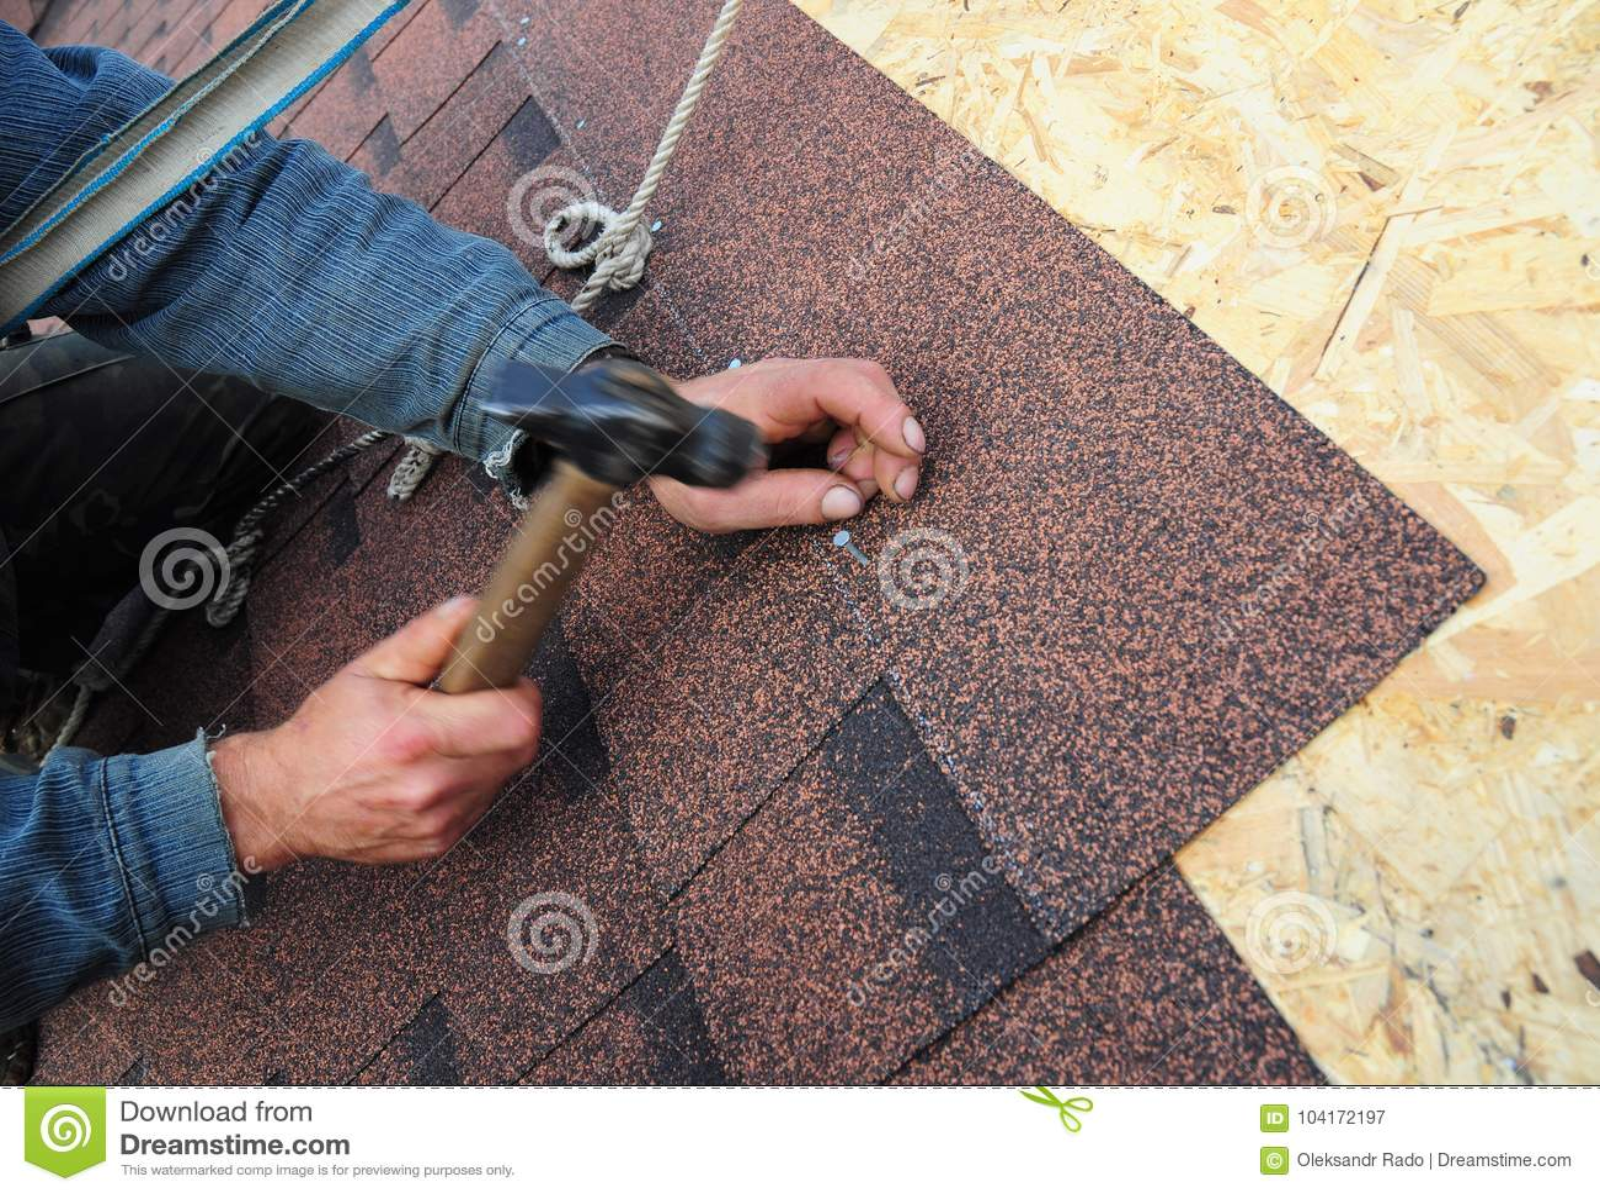 Roofer Install Asphalt Roof Shingles Sluit omhoog mening over Roofer Installation Asphalt Roofing Shingles Installation